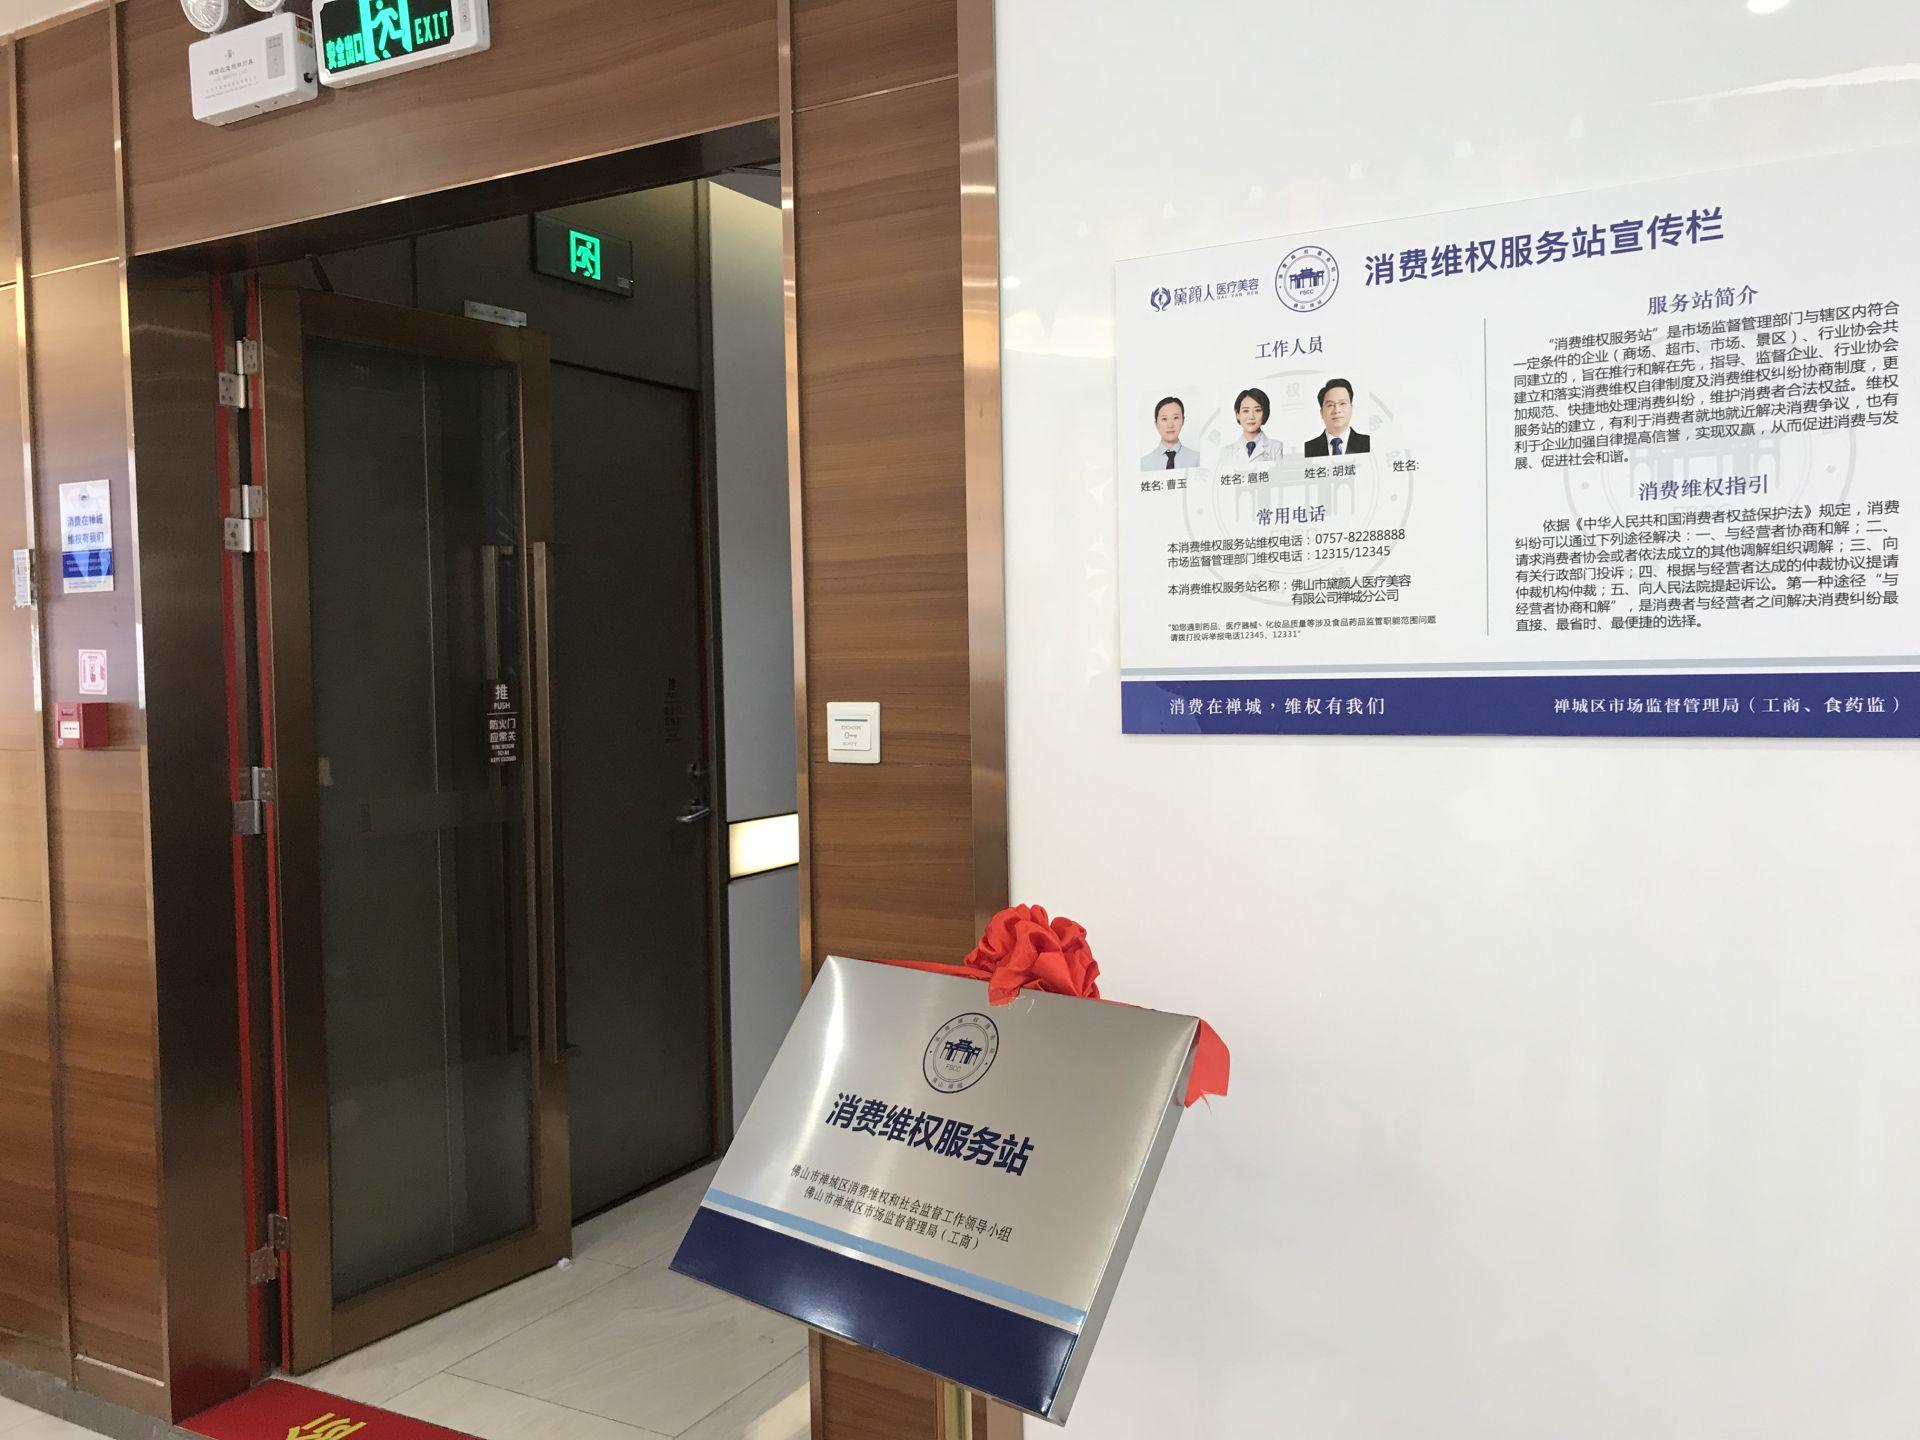 bob开户:禅城:建立首家医疗美容领域消费维权服务站